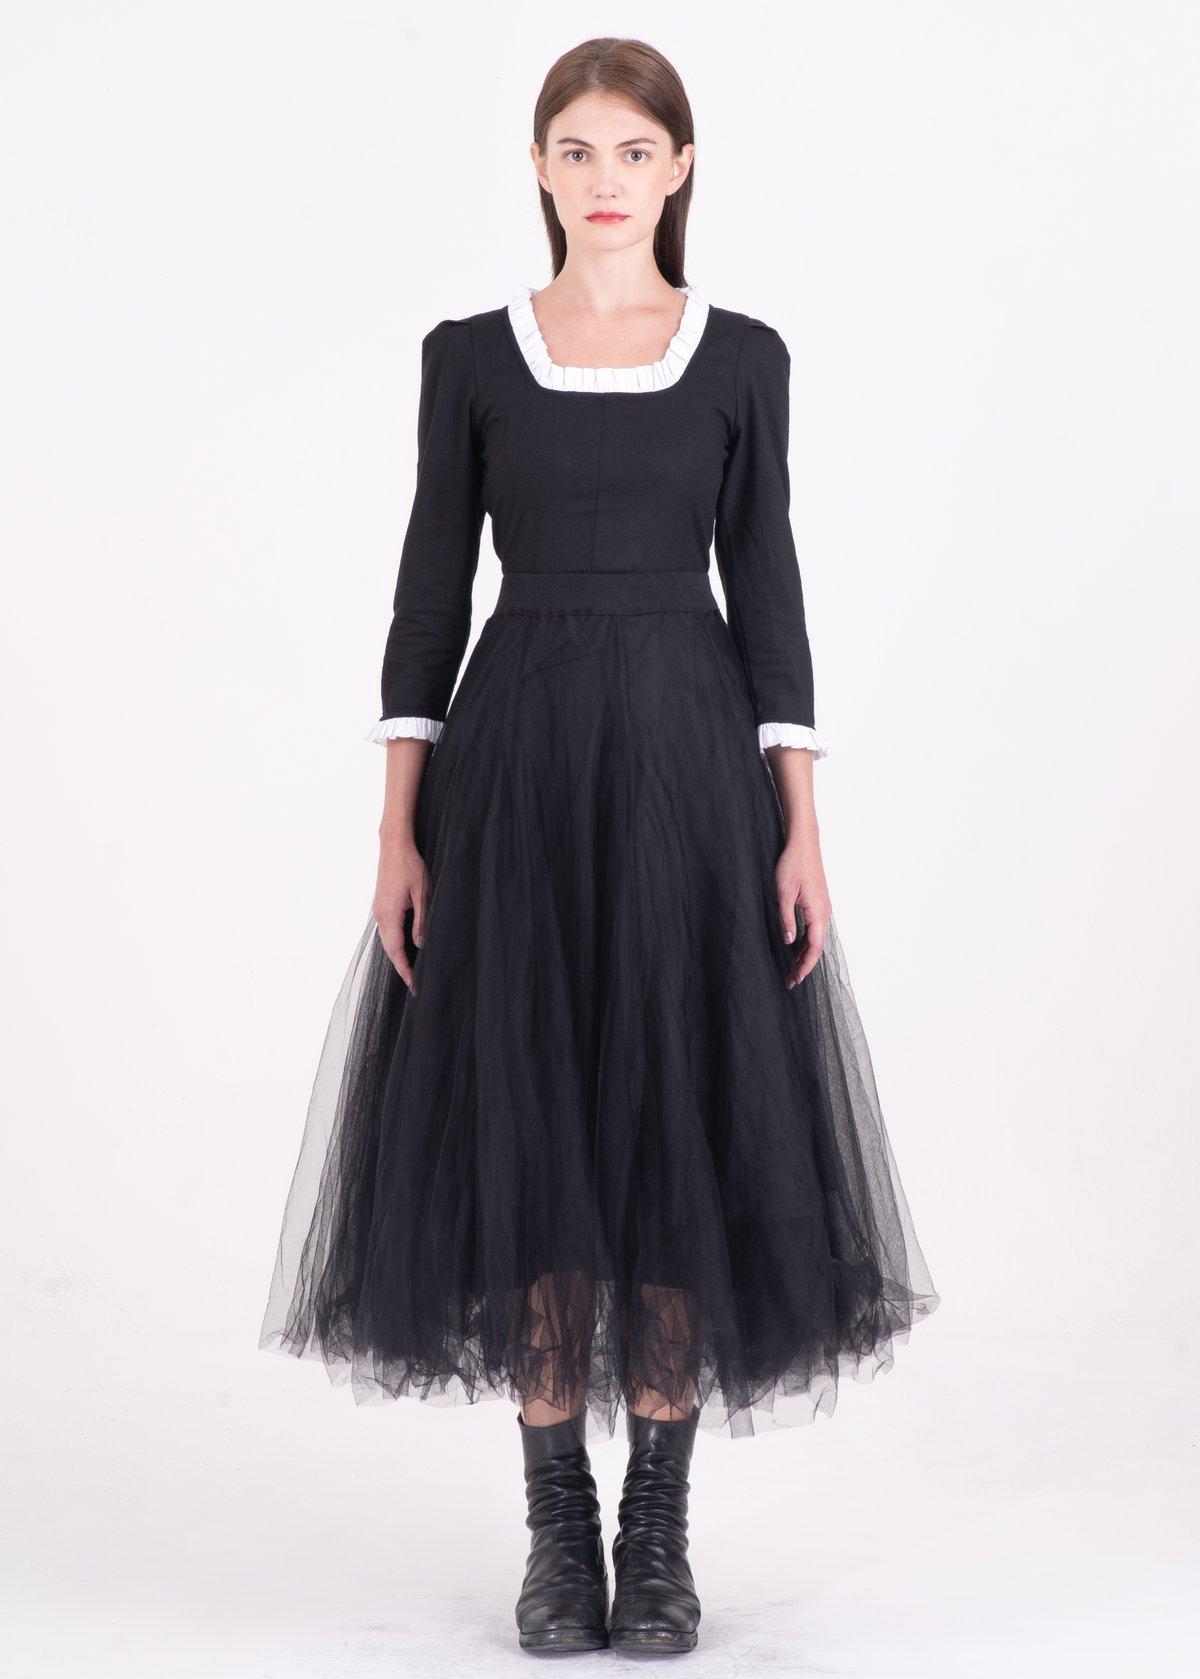 Image of Quadruple Layered Tulle Skirt Black